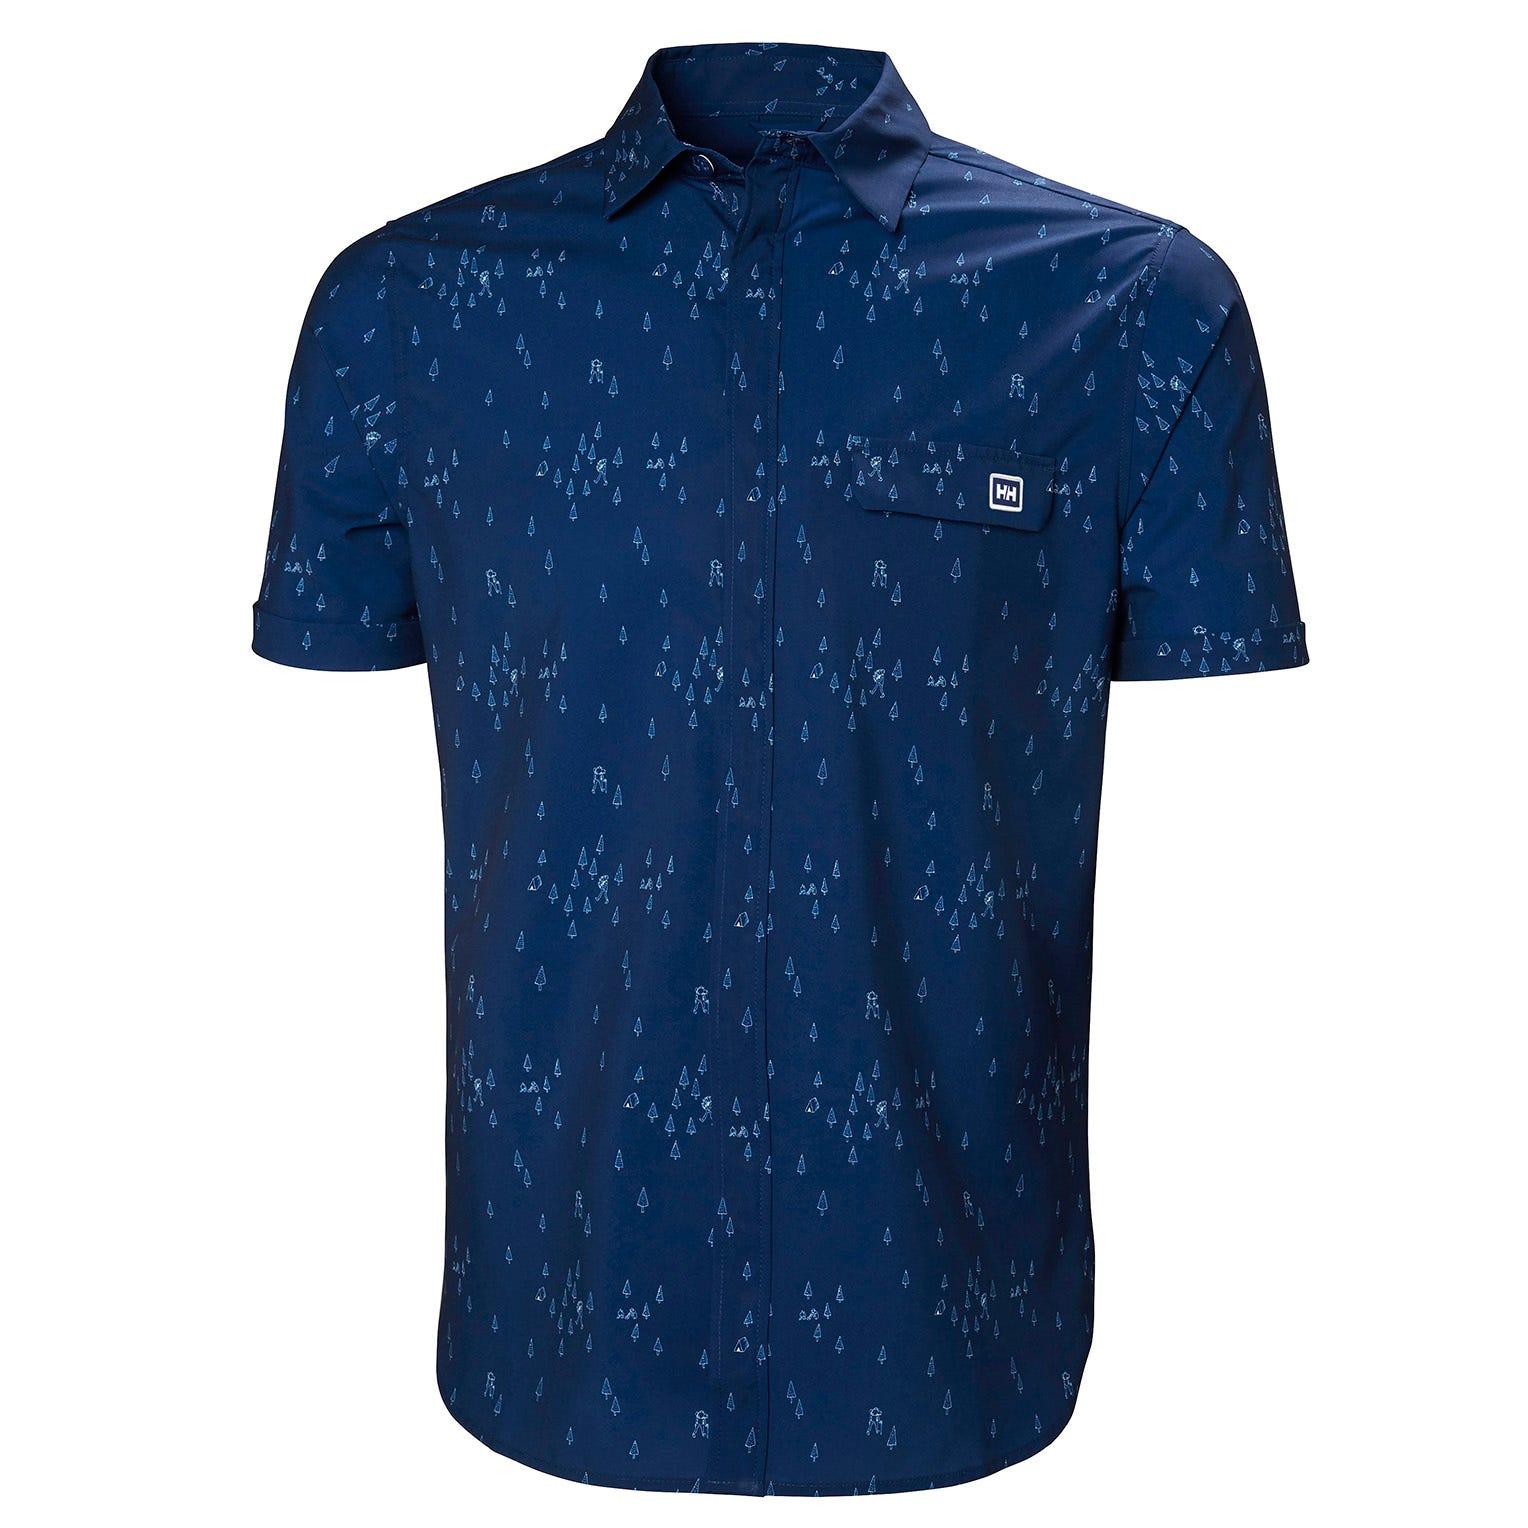 Helly Hansen Oya Shirt Blue L